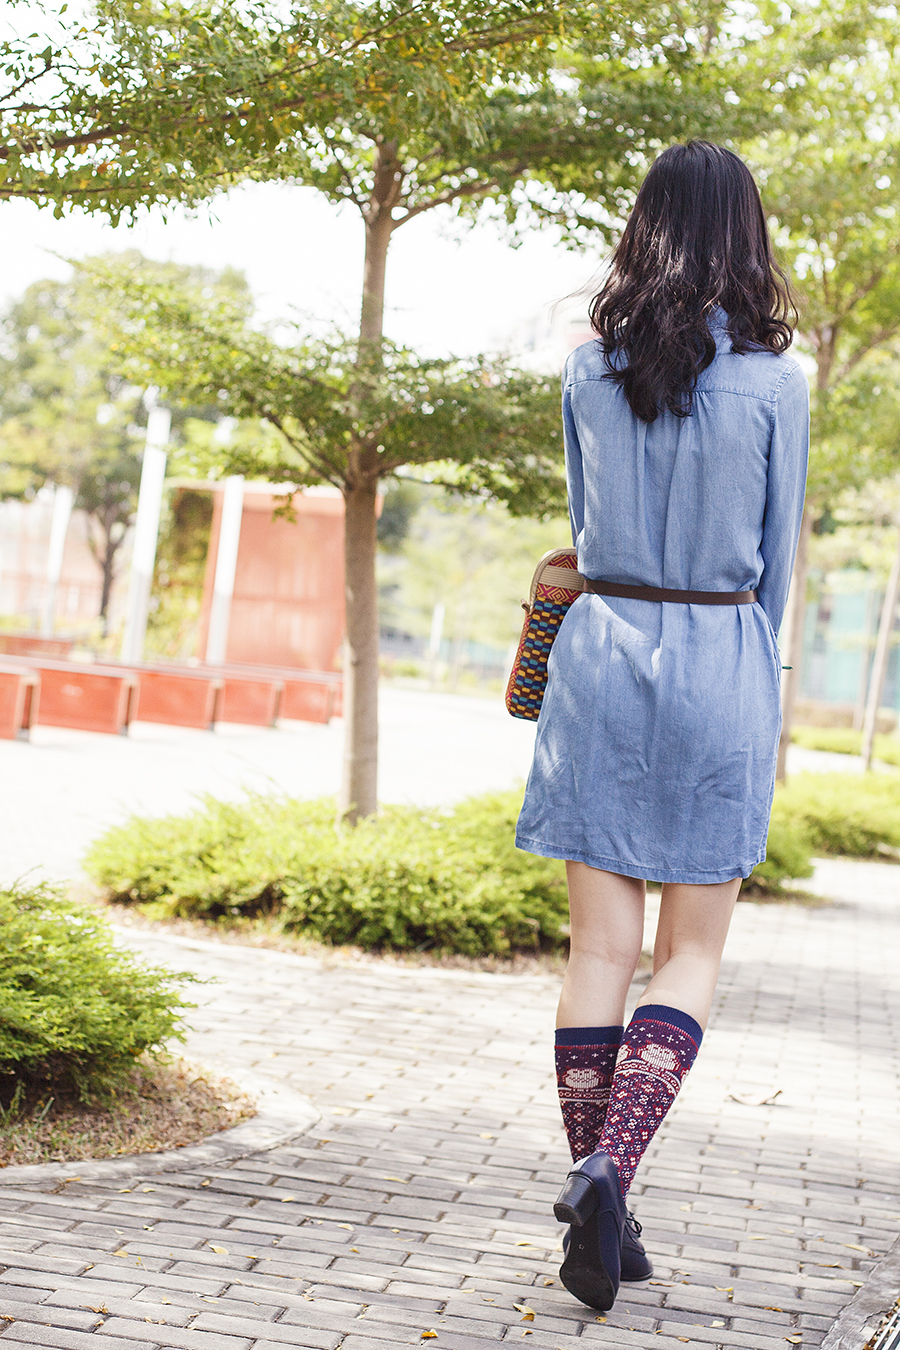 Uniqlo long-sleeved denim dress,  Gap black frame glasses, Fossil laptop sleeve, Tutu Anna knee high owl socks, navy oxford heels from Taobao, turquoise leaf earrings from Forever 21.